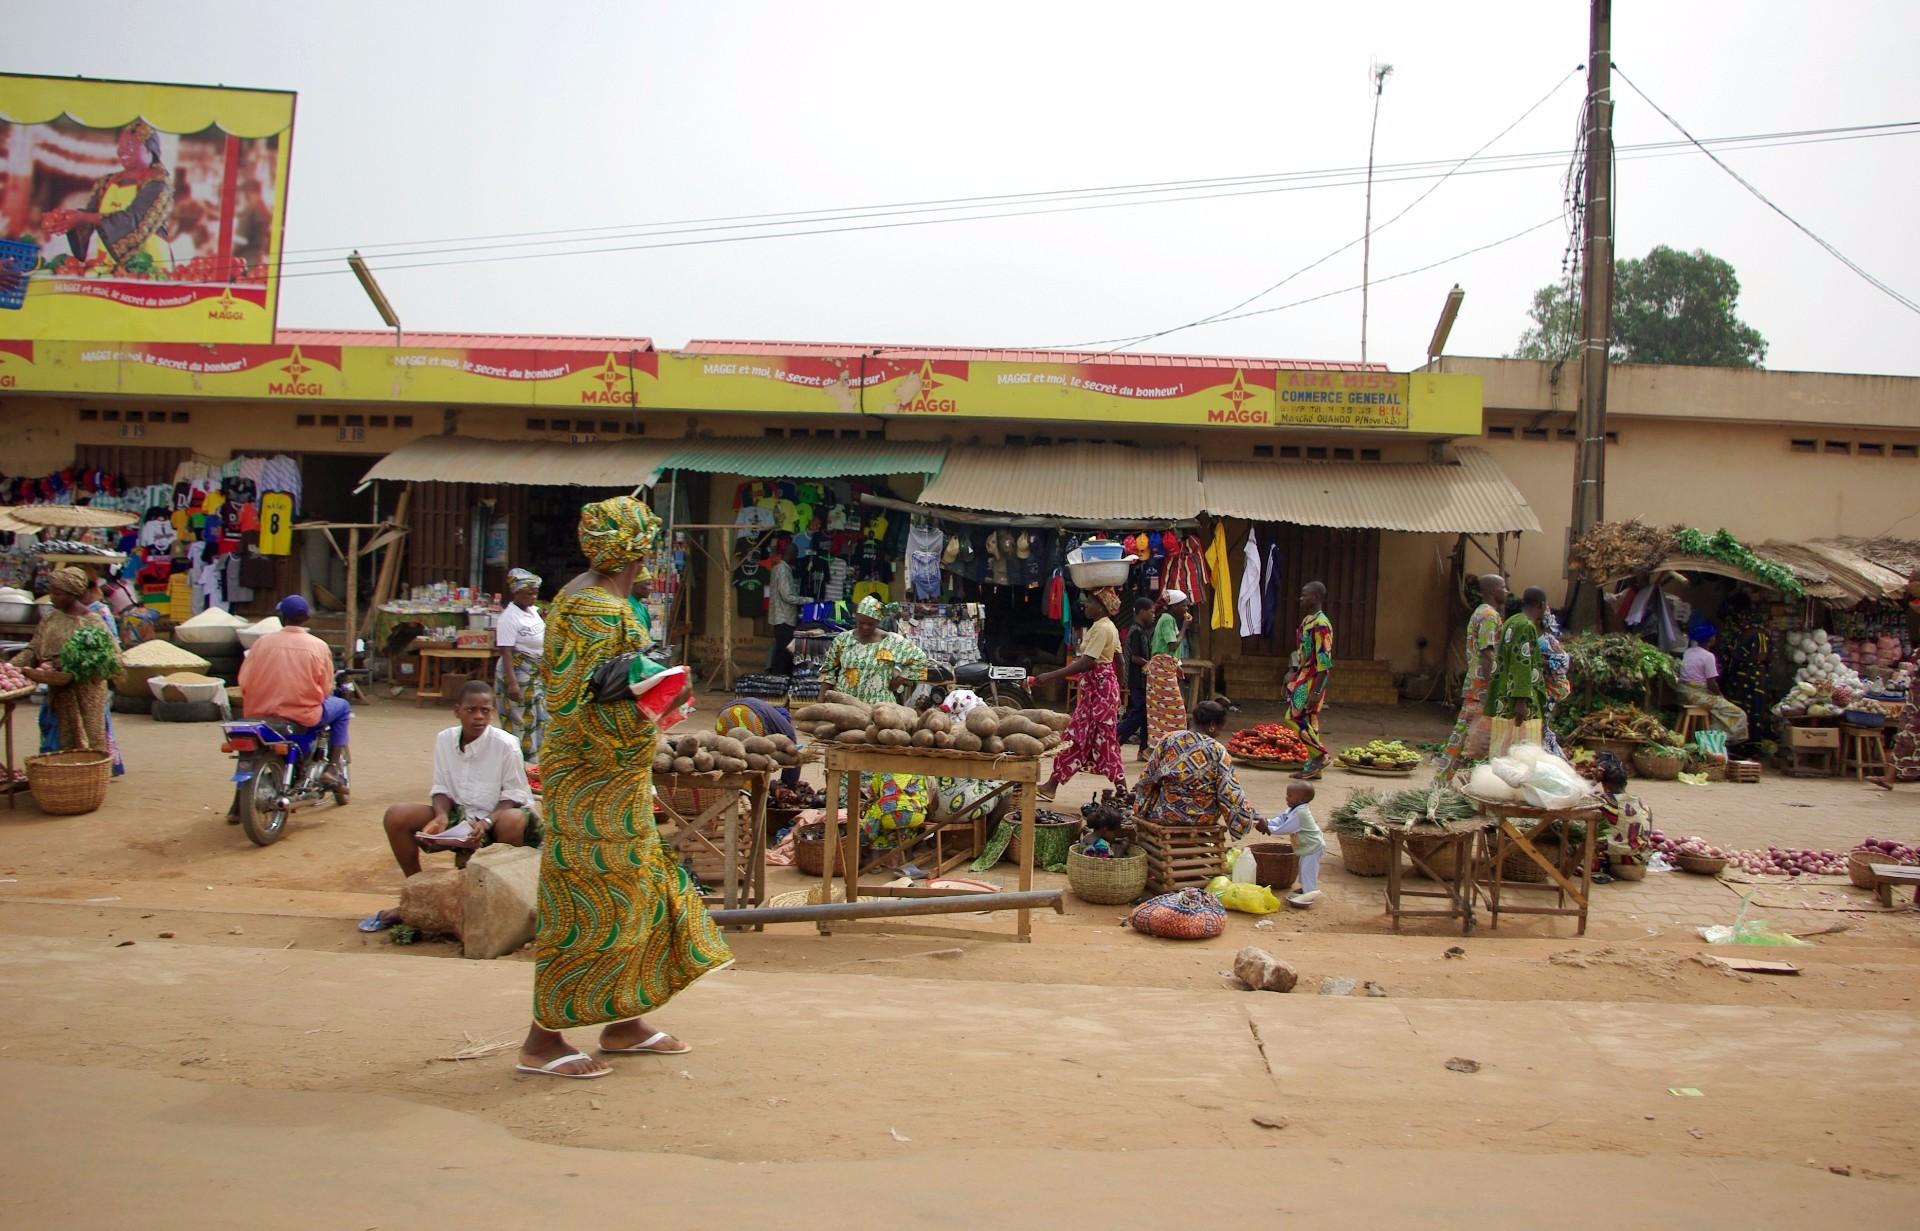 Benin Population in 2017